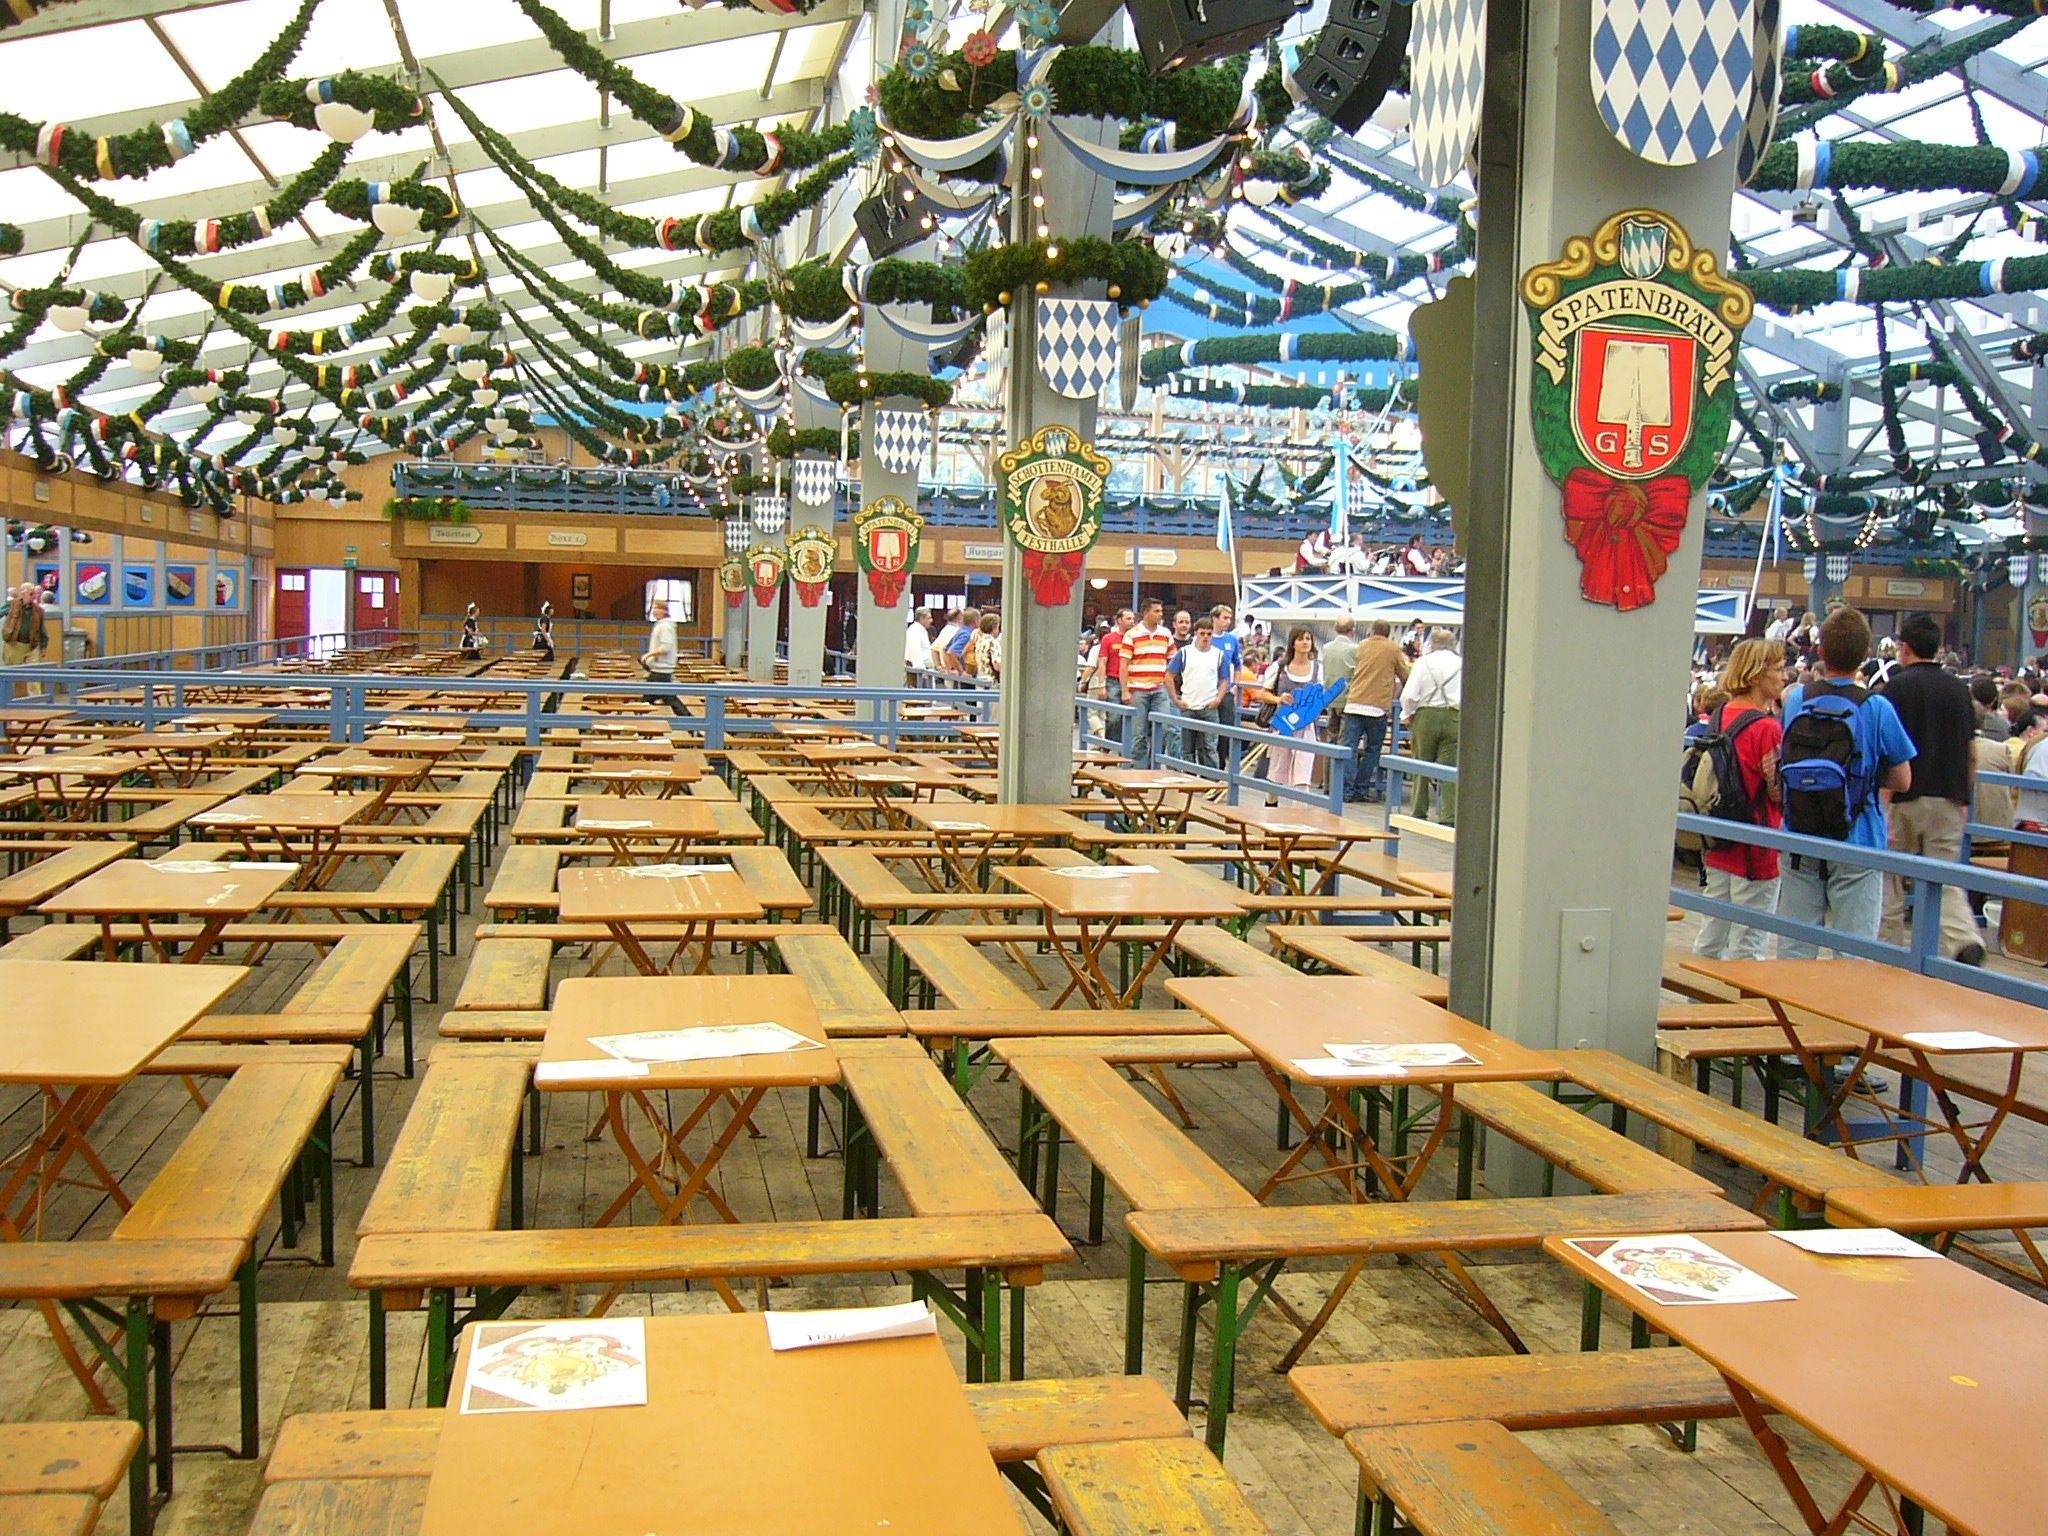 Schottenhamel tent beer logos and checkered banner on tent pole & Schottenhamel tent beer logos and checkered banner on tent pole ...